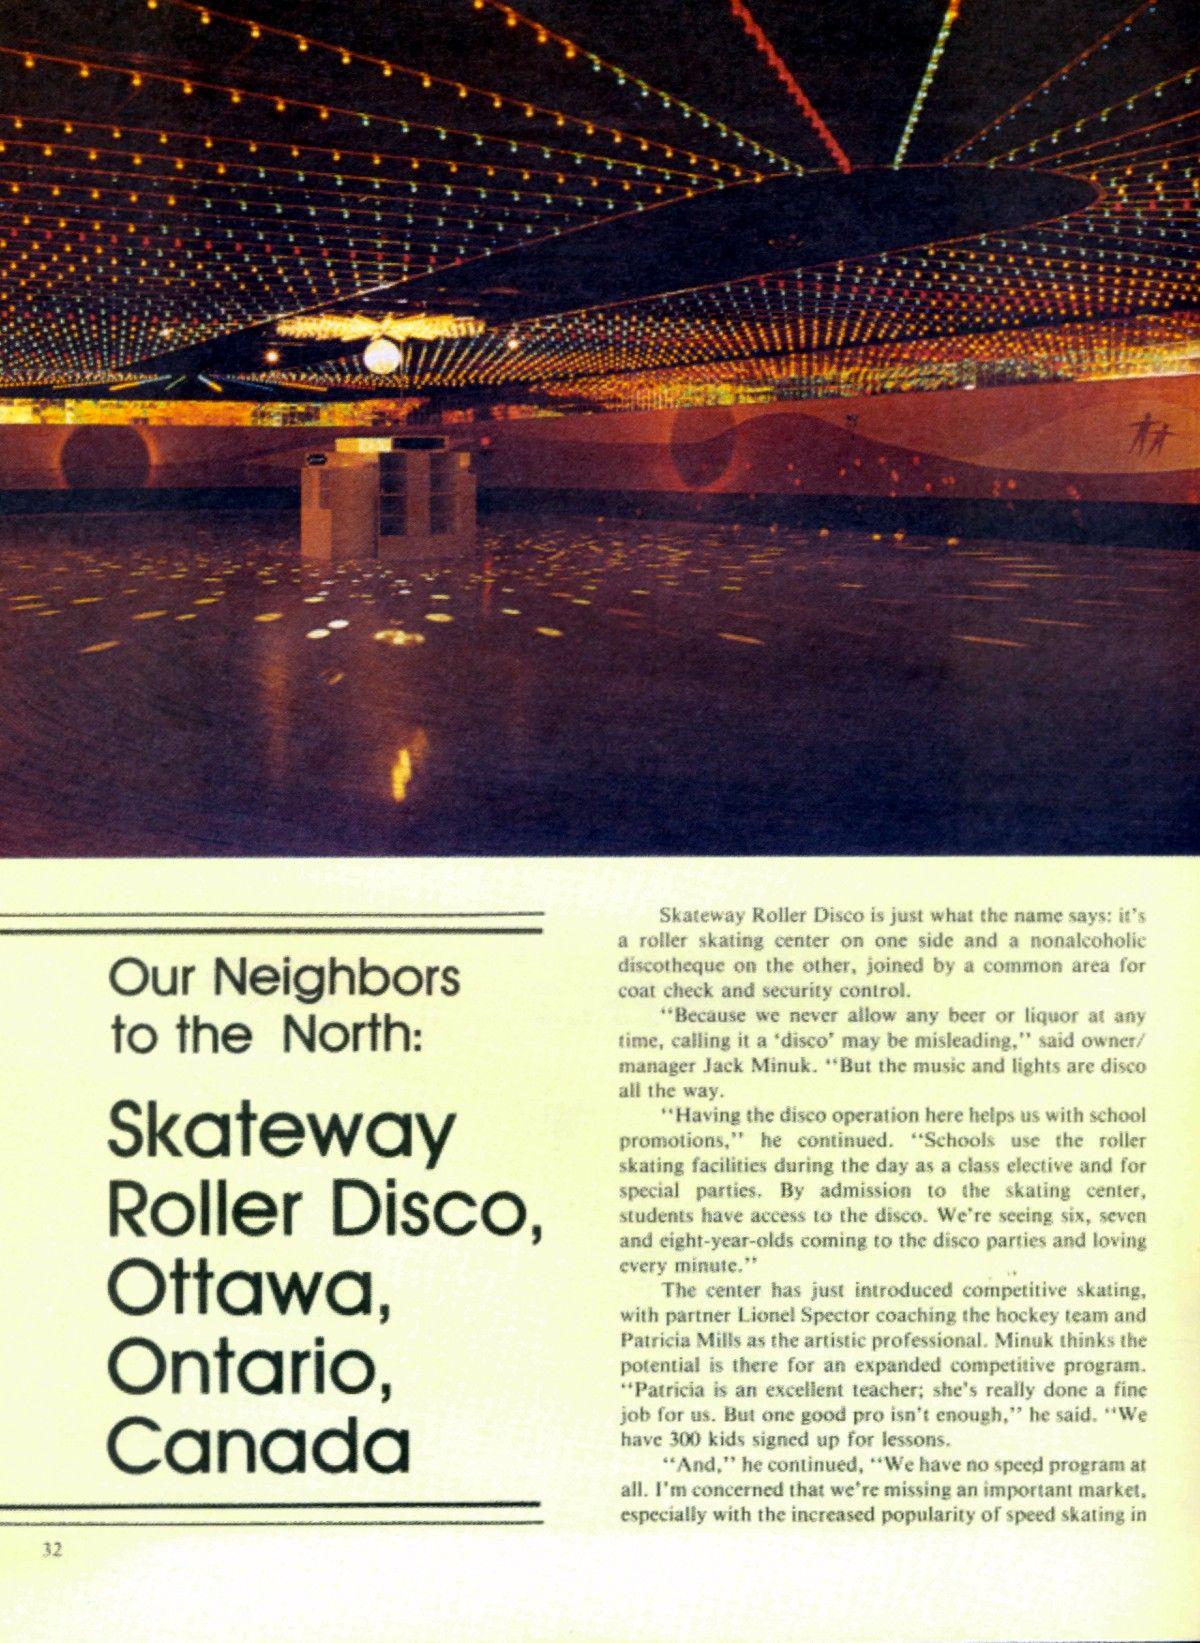 Roller skating rink ontario -  70s 80s Roller Skating Disco Style Rink